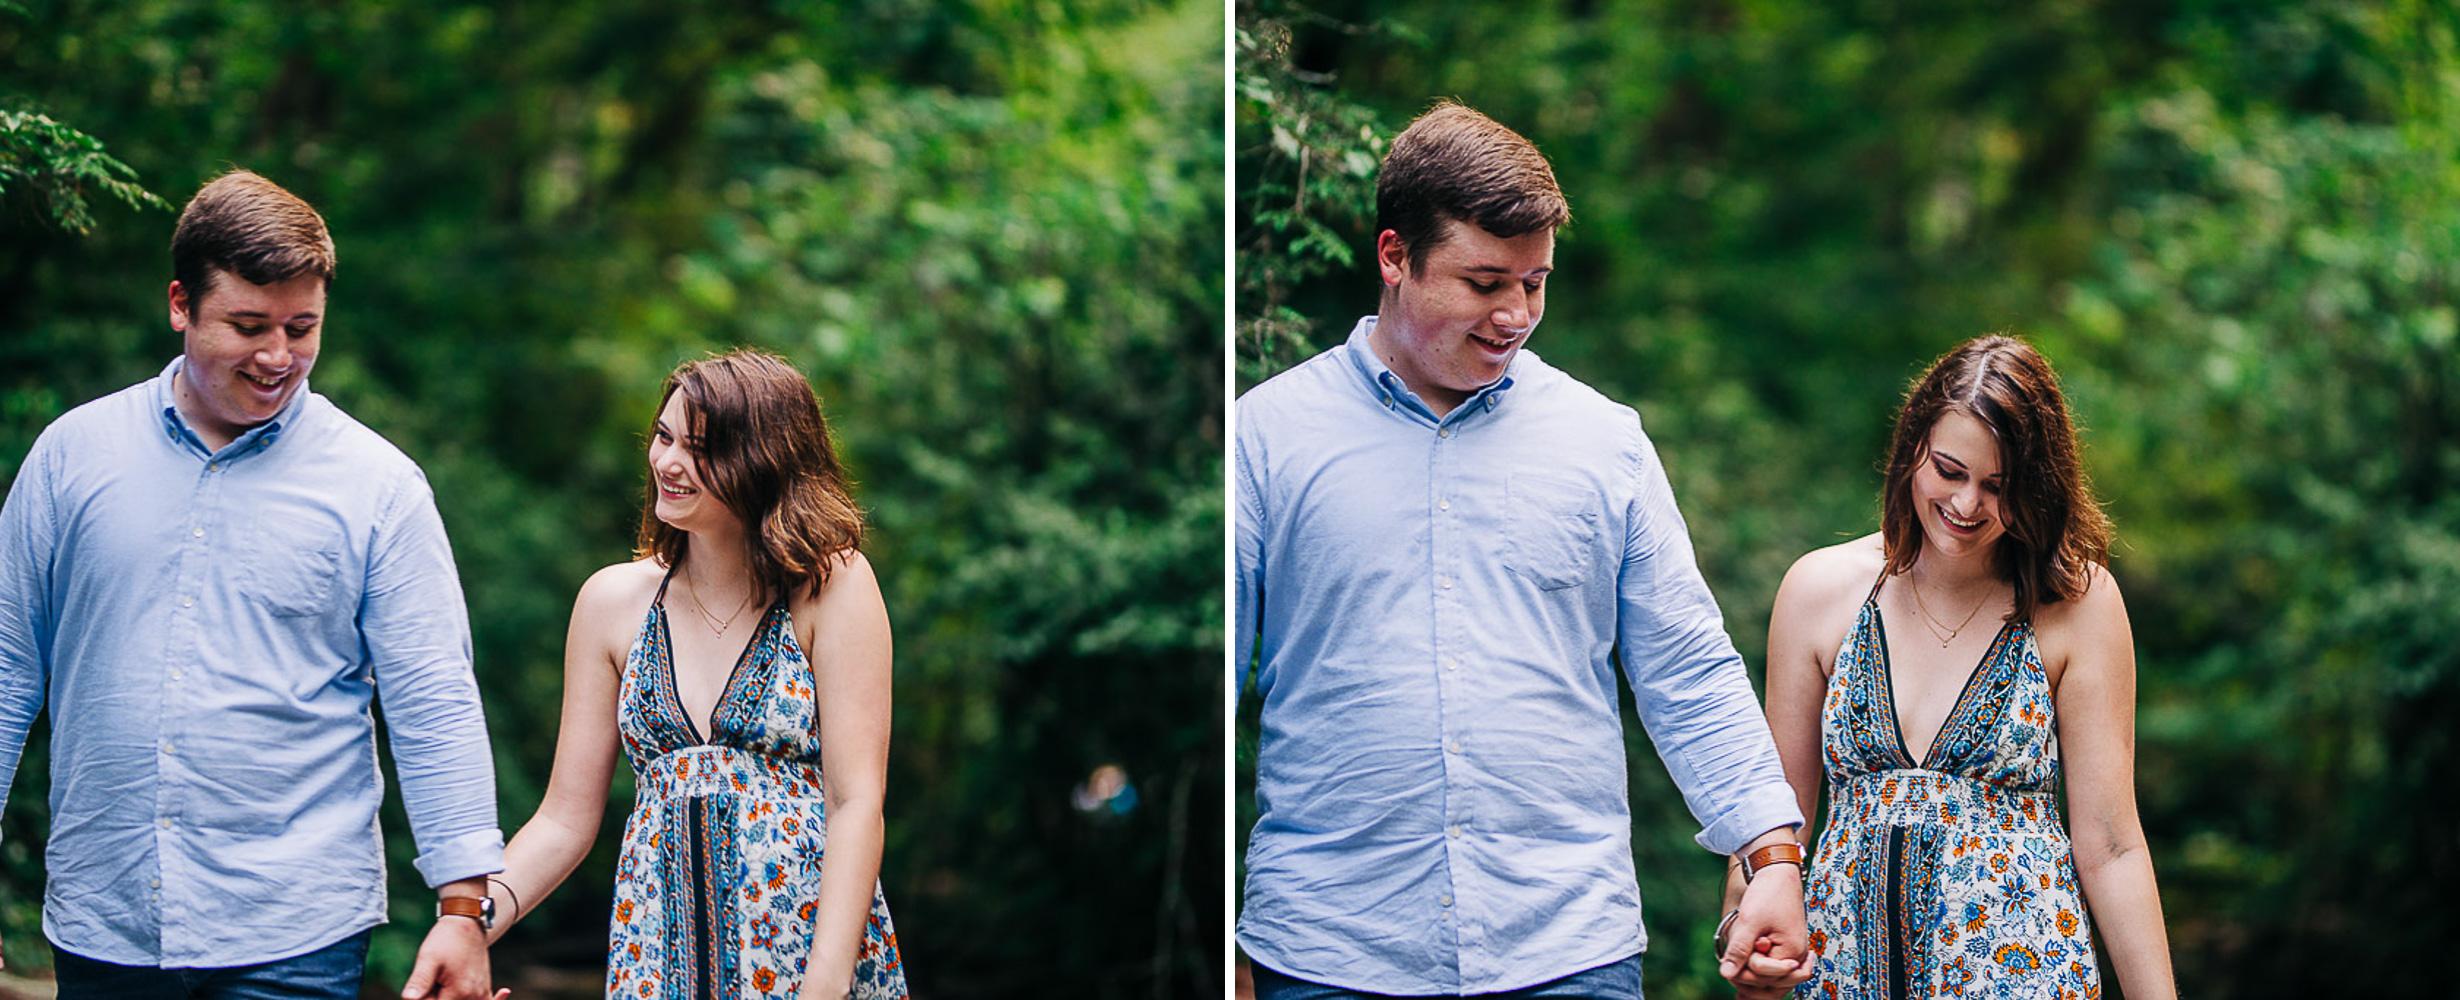 River Engagement Portraits, Summer Engagement Portraits, Engaged, South Carolina 19.jpg